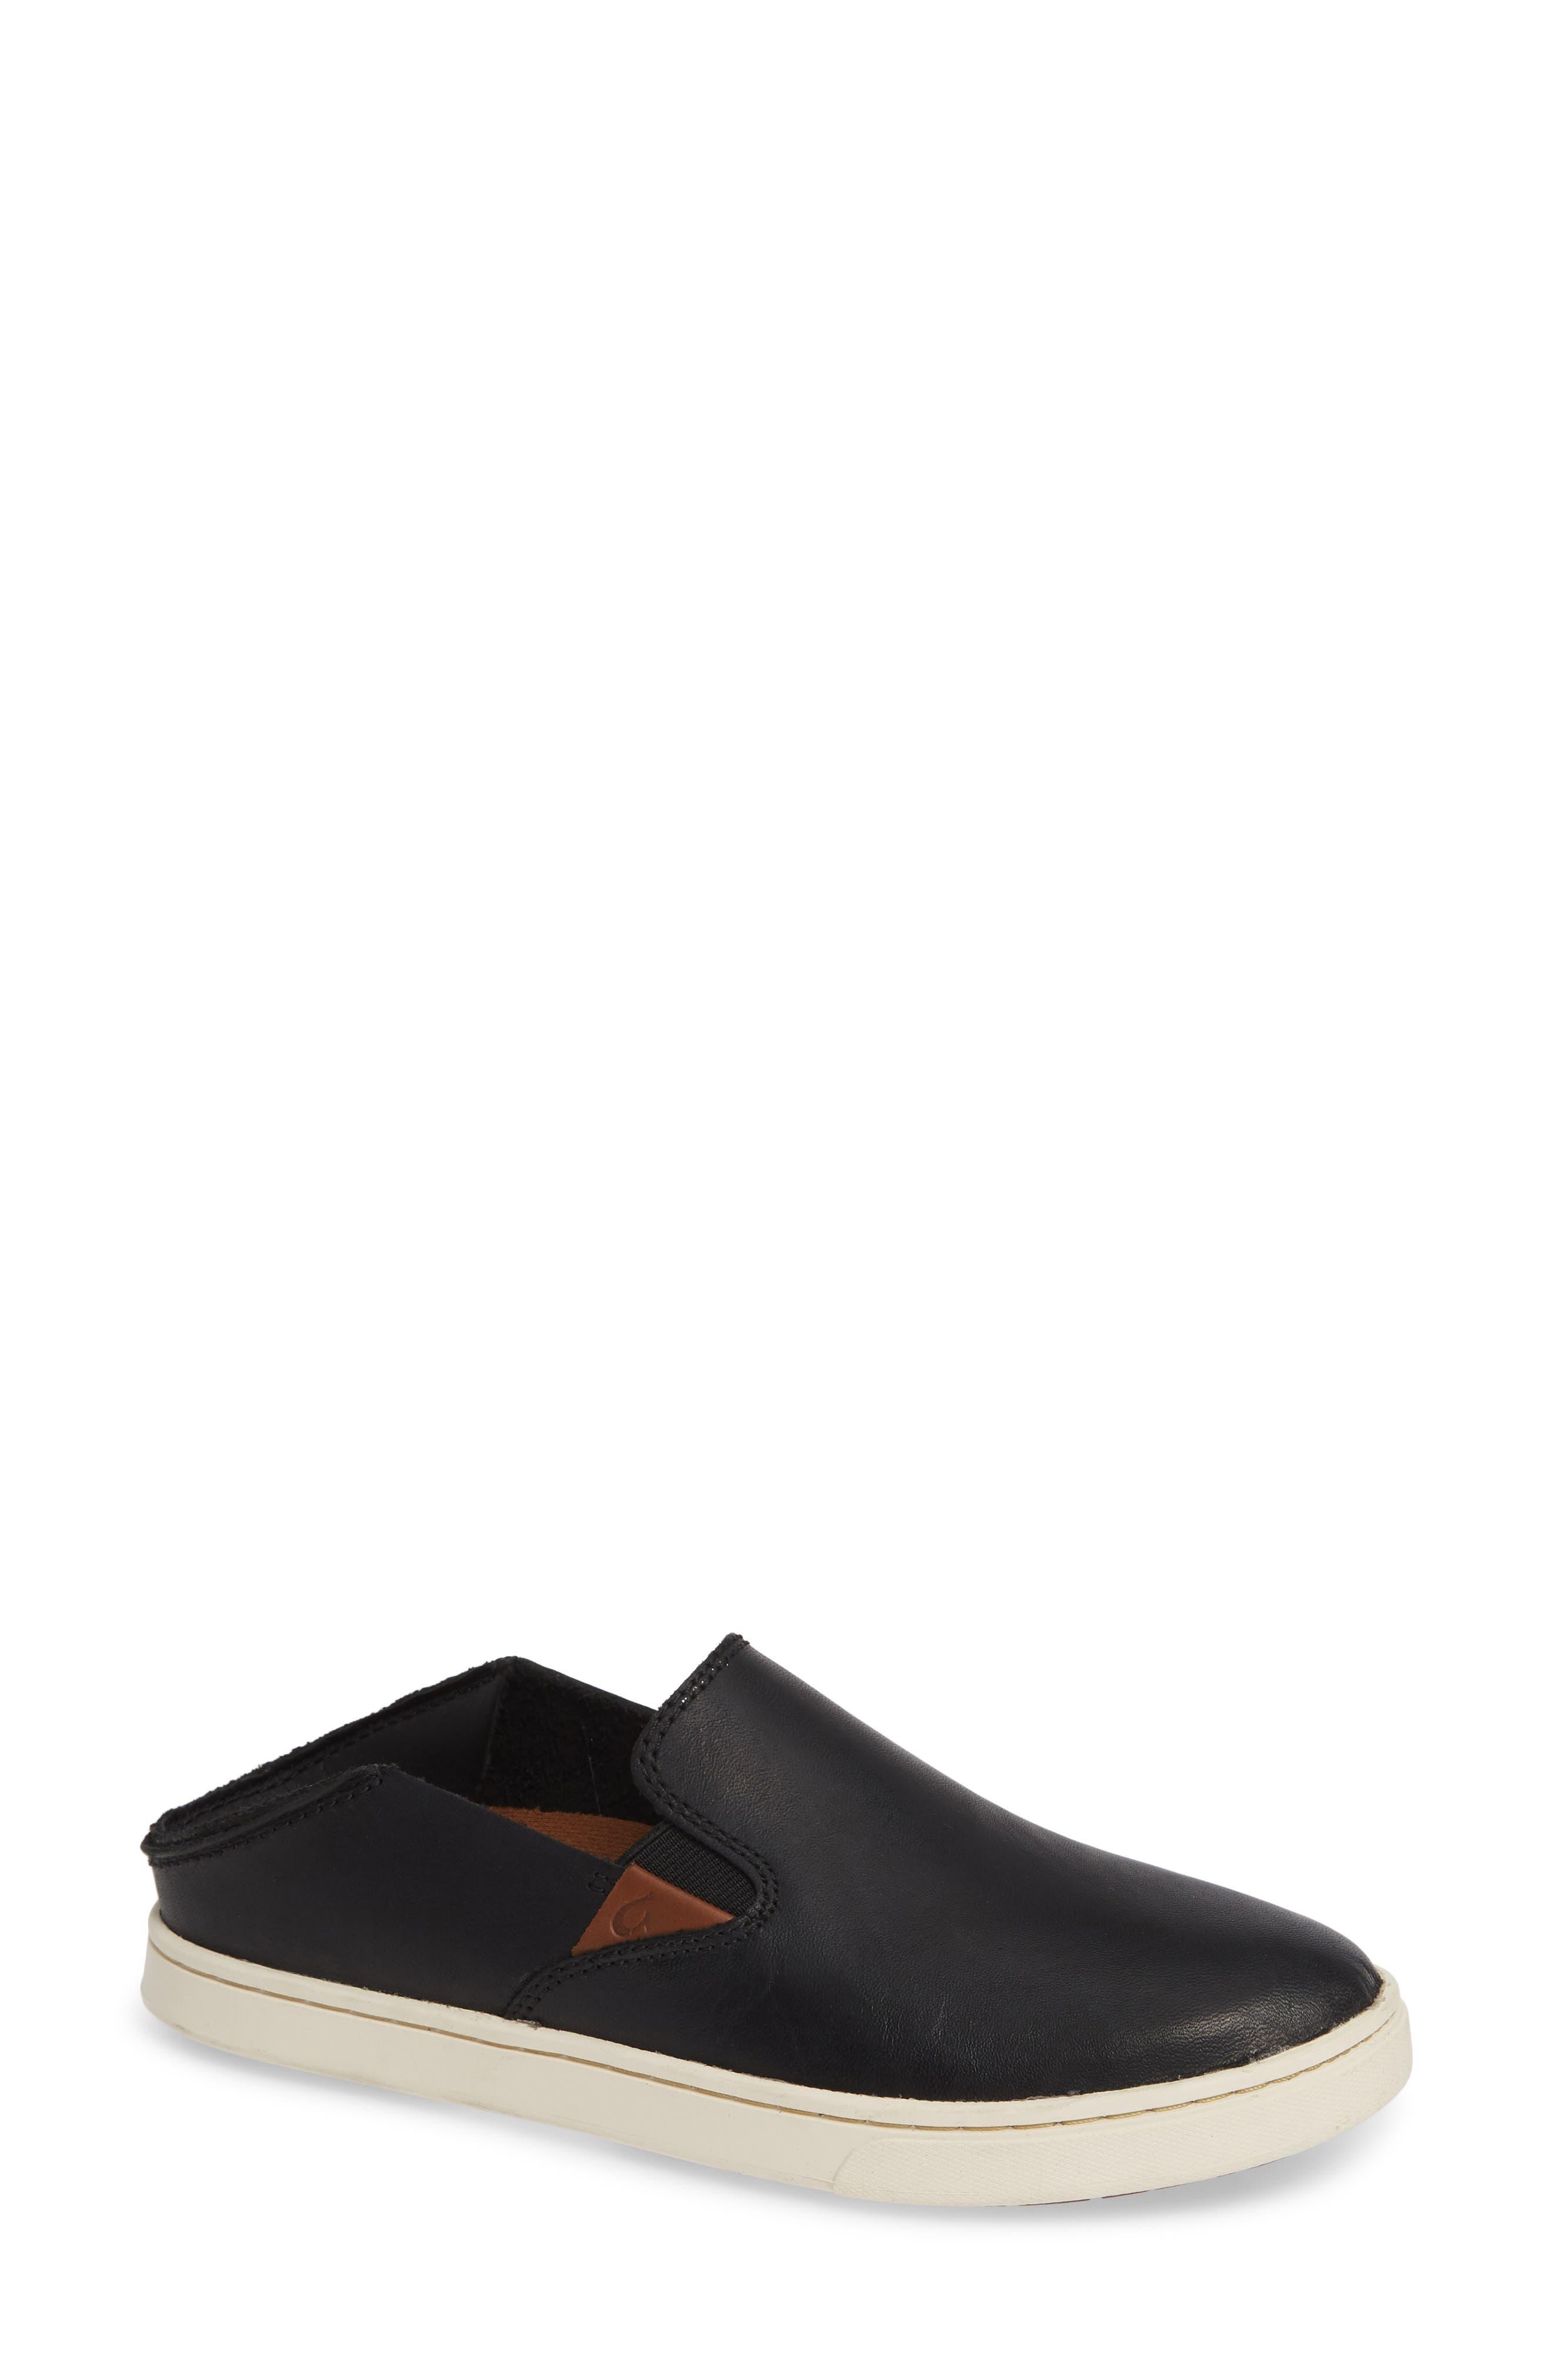 Pehuea Slip-On Sneaker,                         Main,                         color, BLACK/ BLACK LEATHER